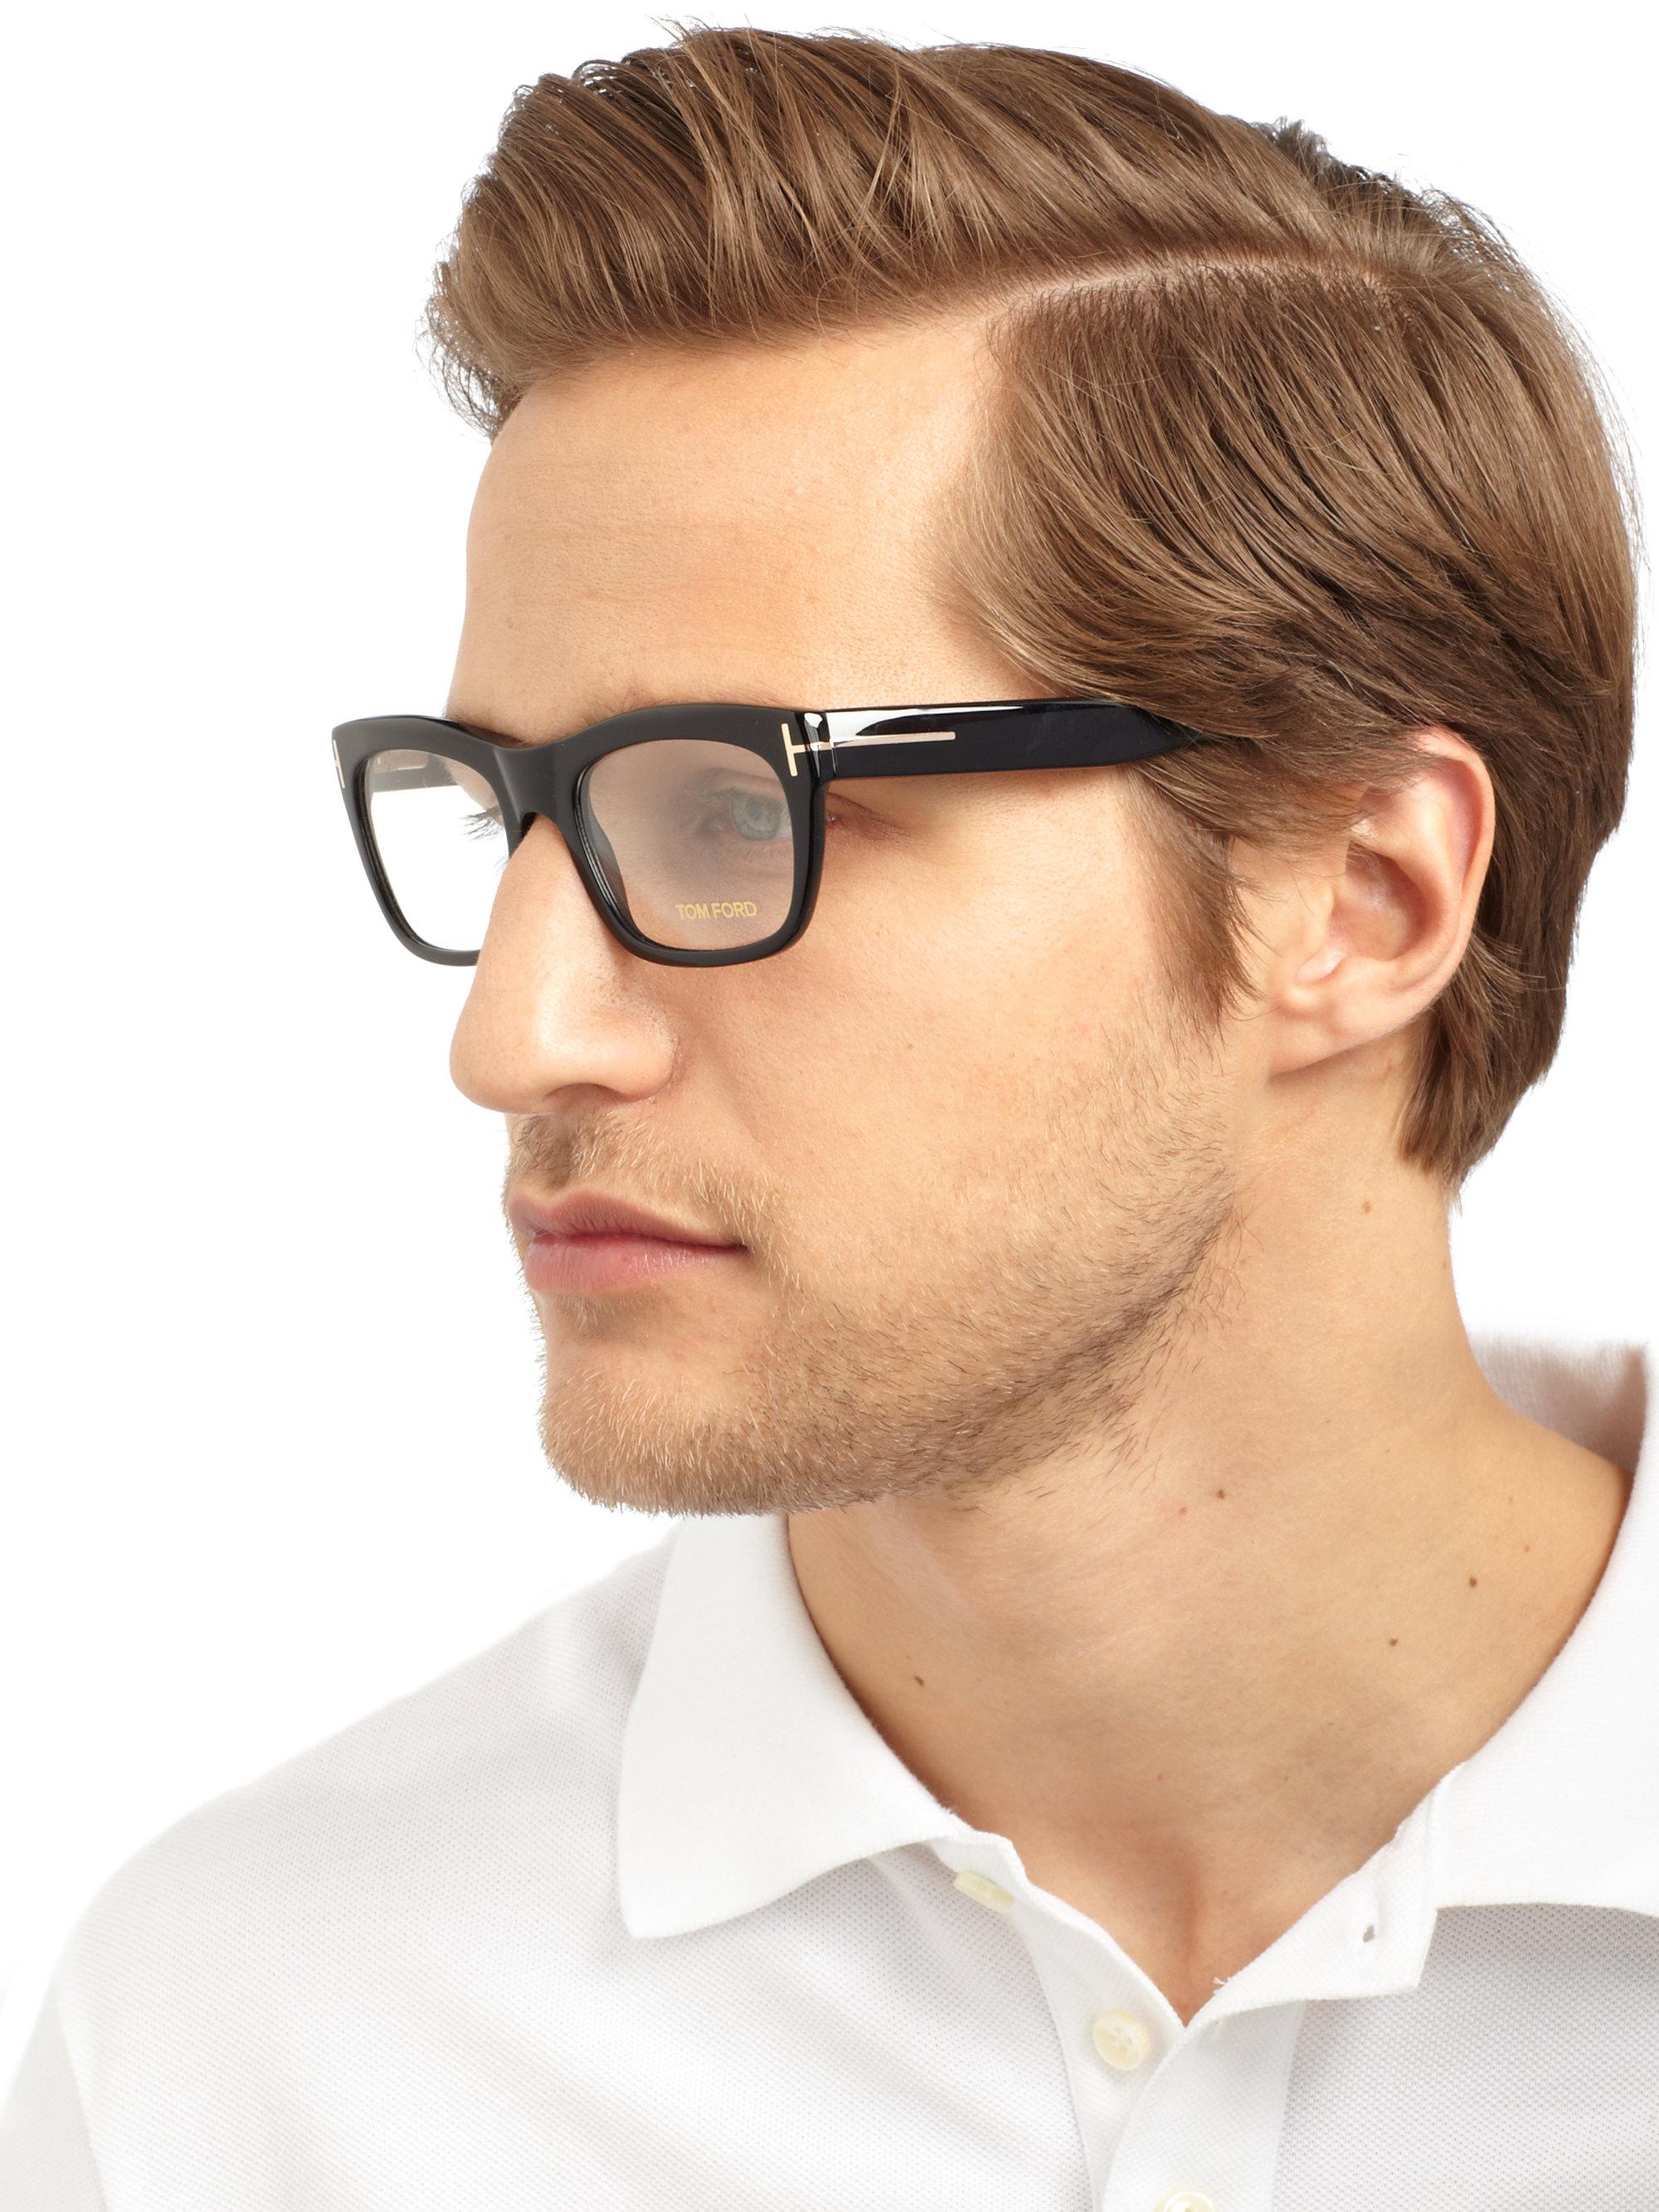 Lyst - Tom Ford Shiny Optical Frames in Black for Men